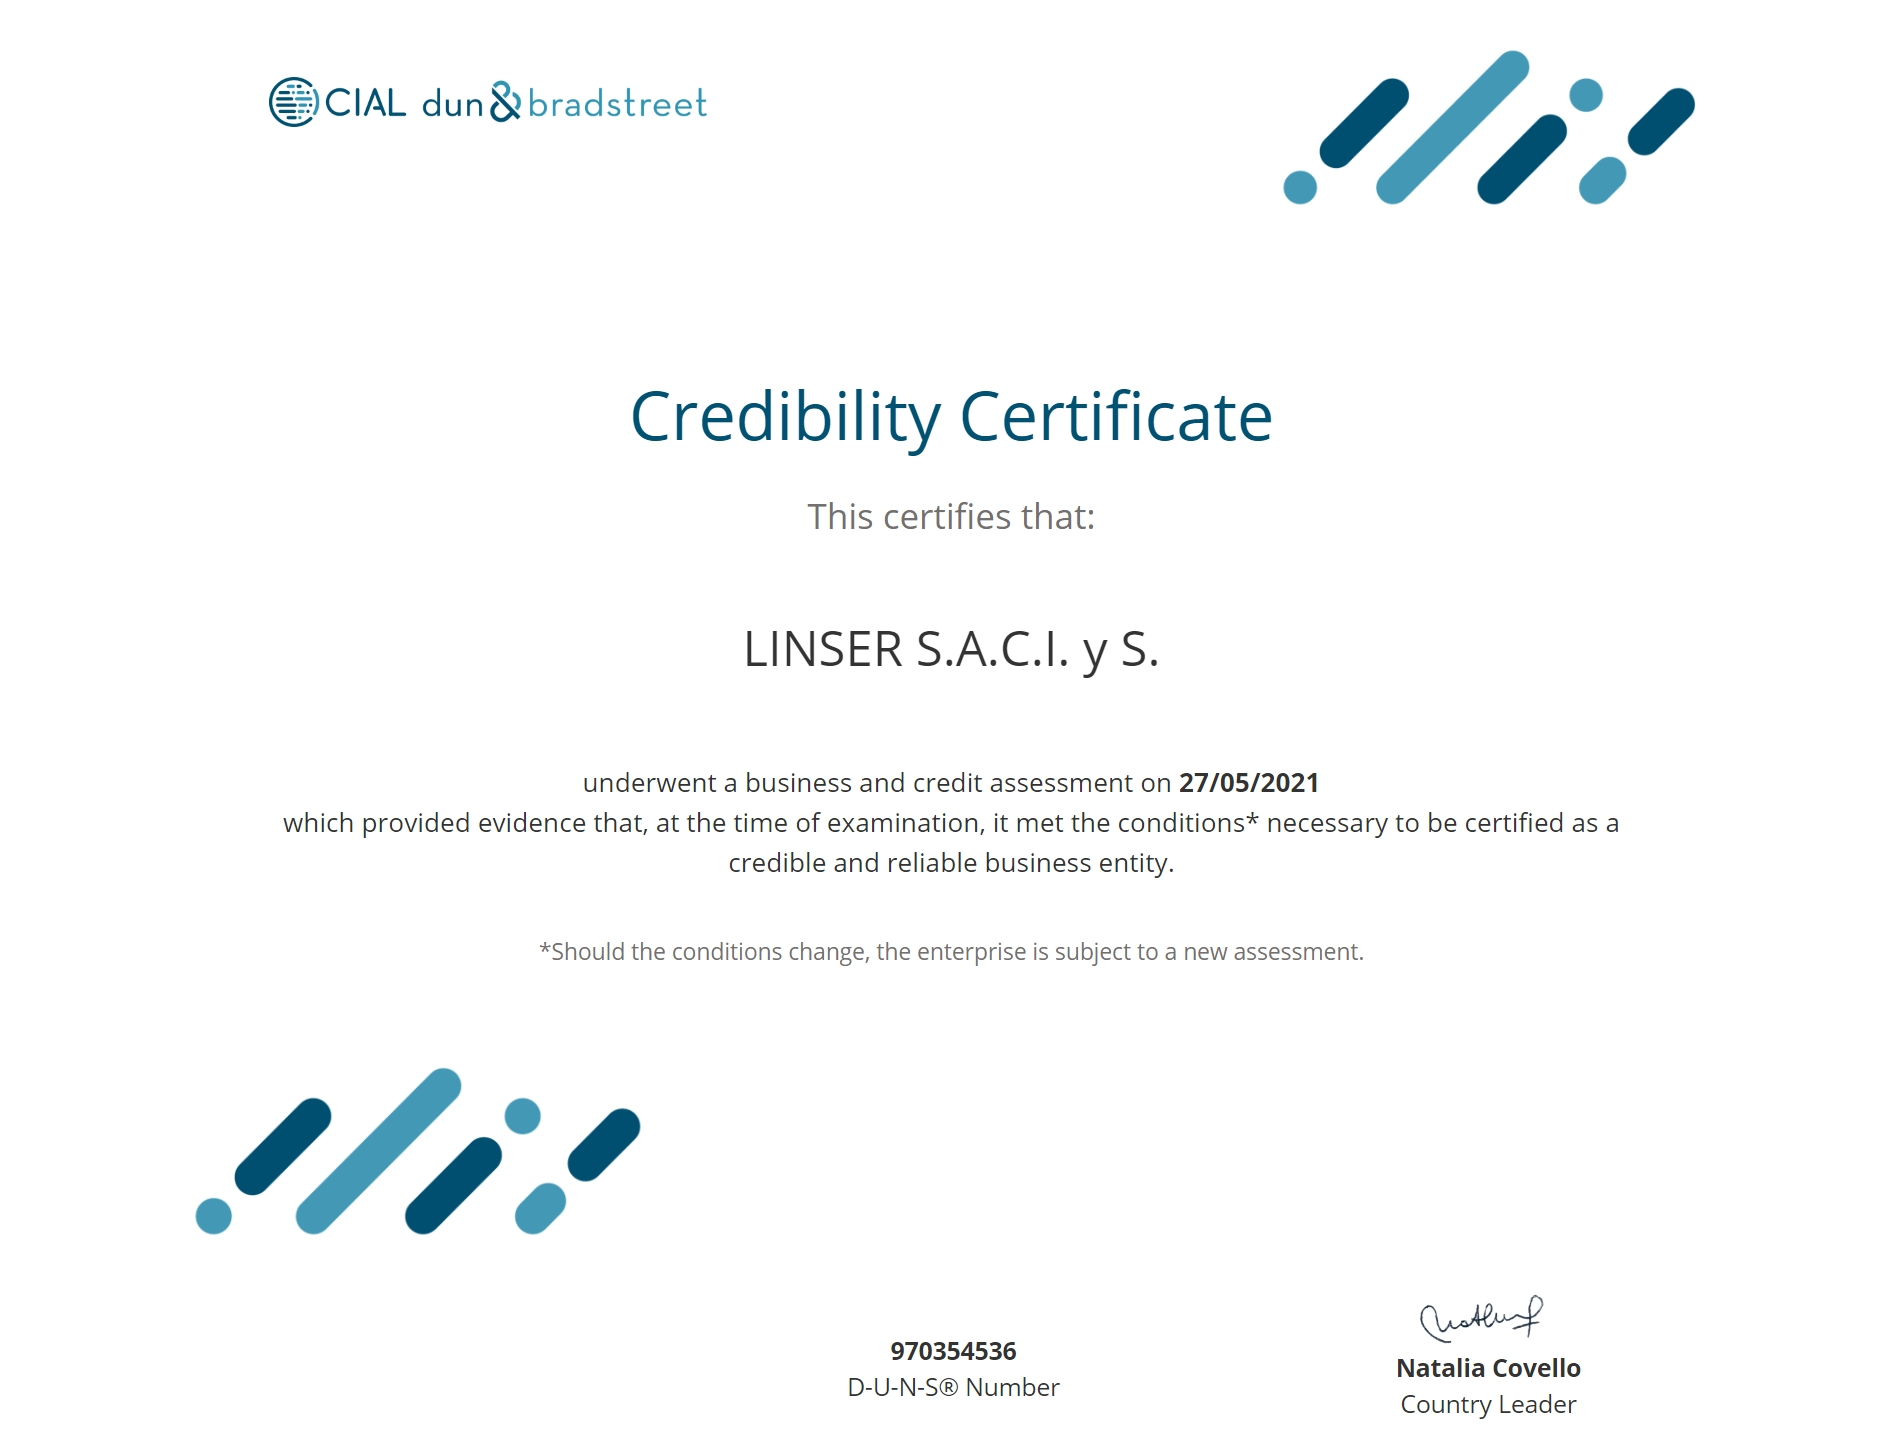 credibility_certificate.jpg